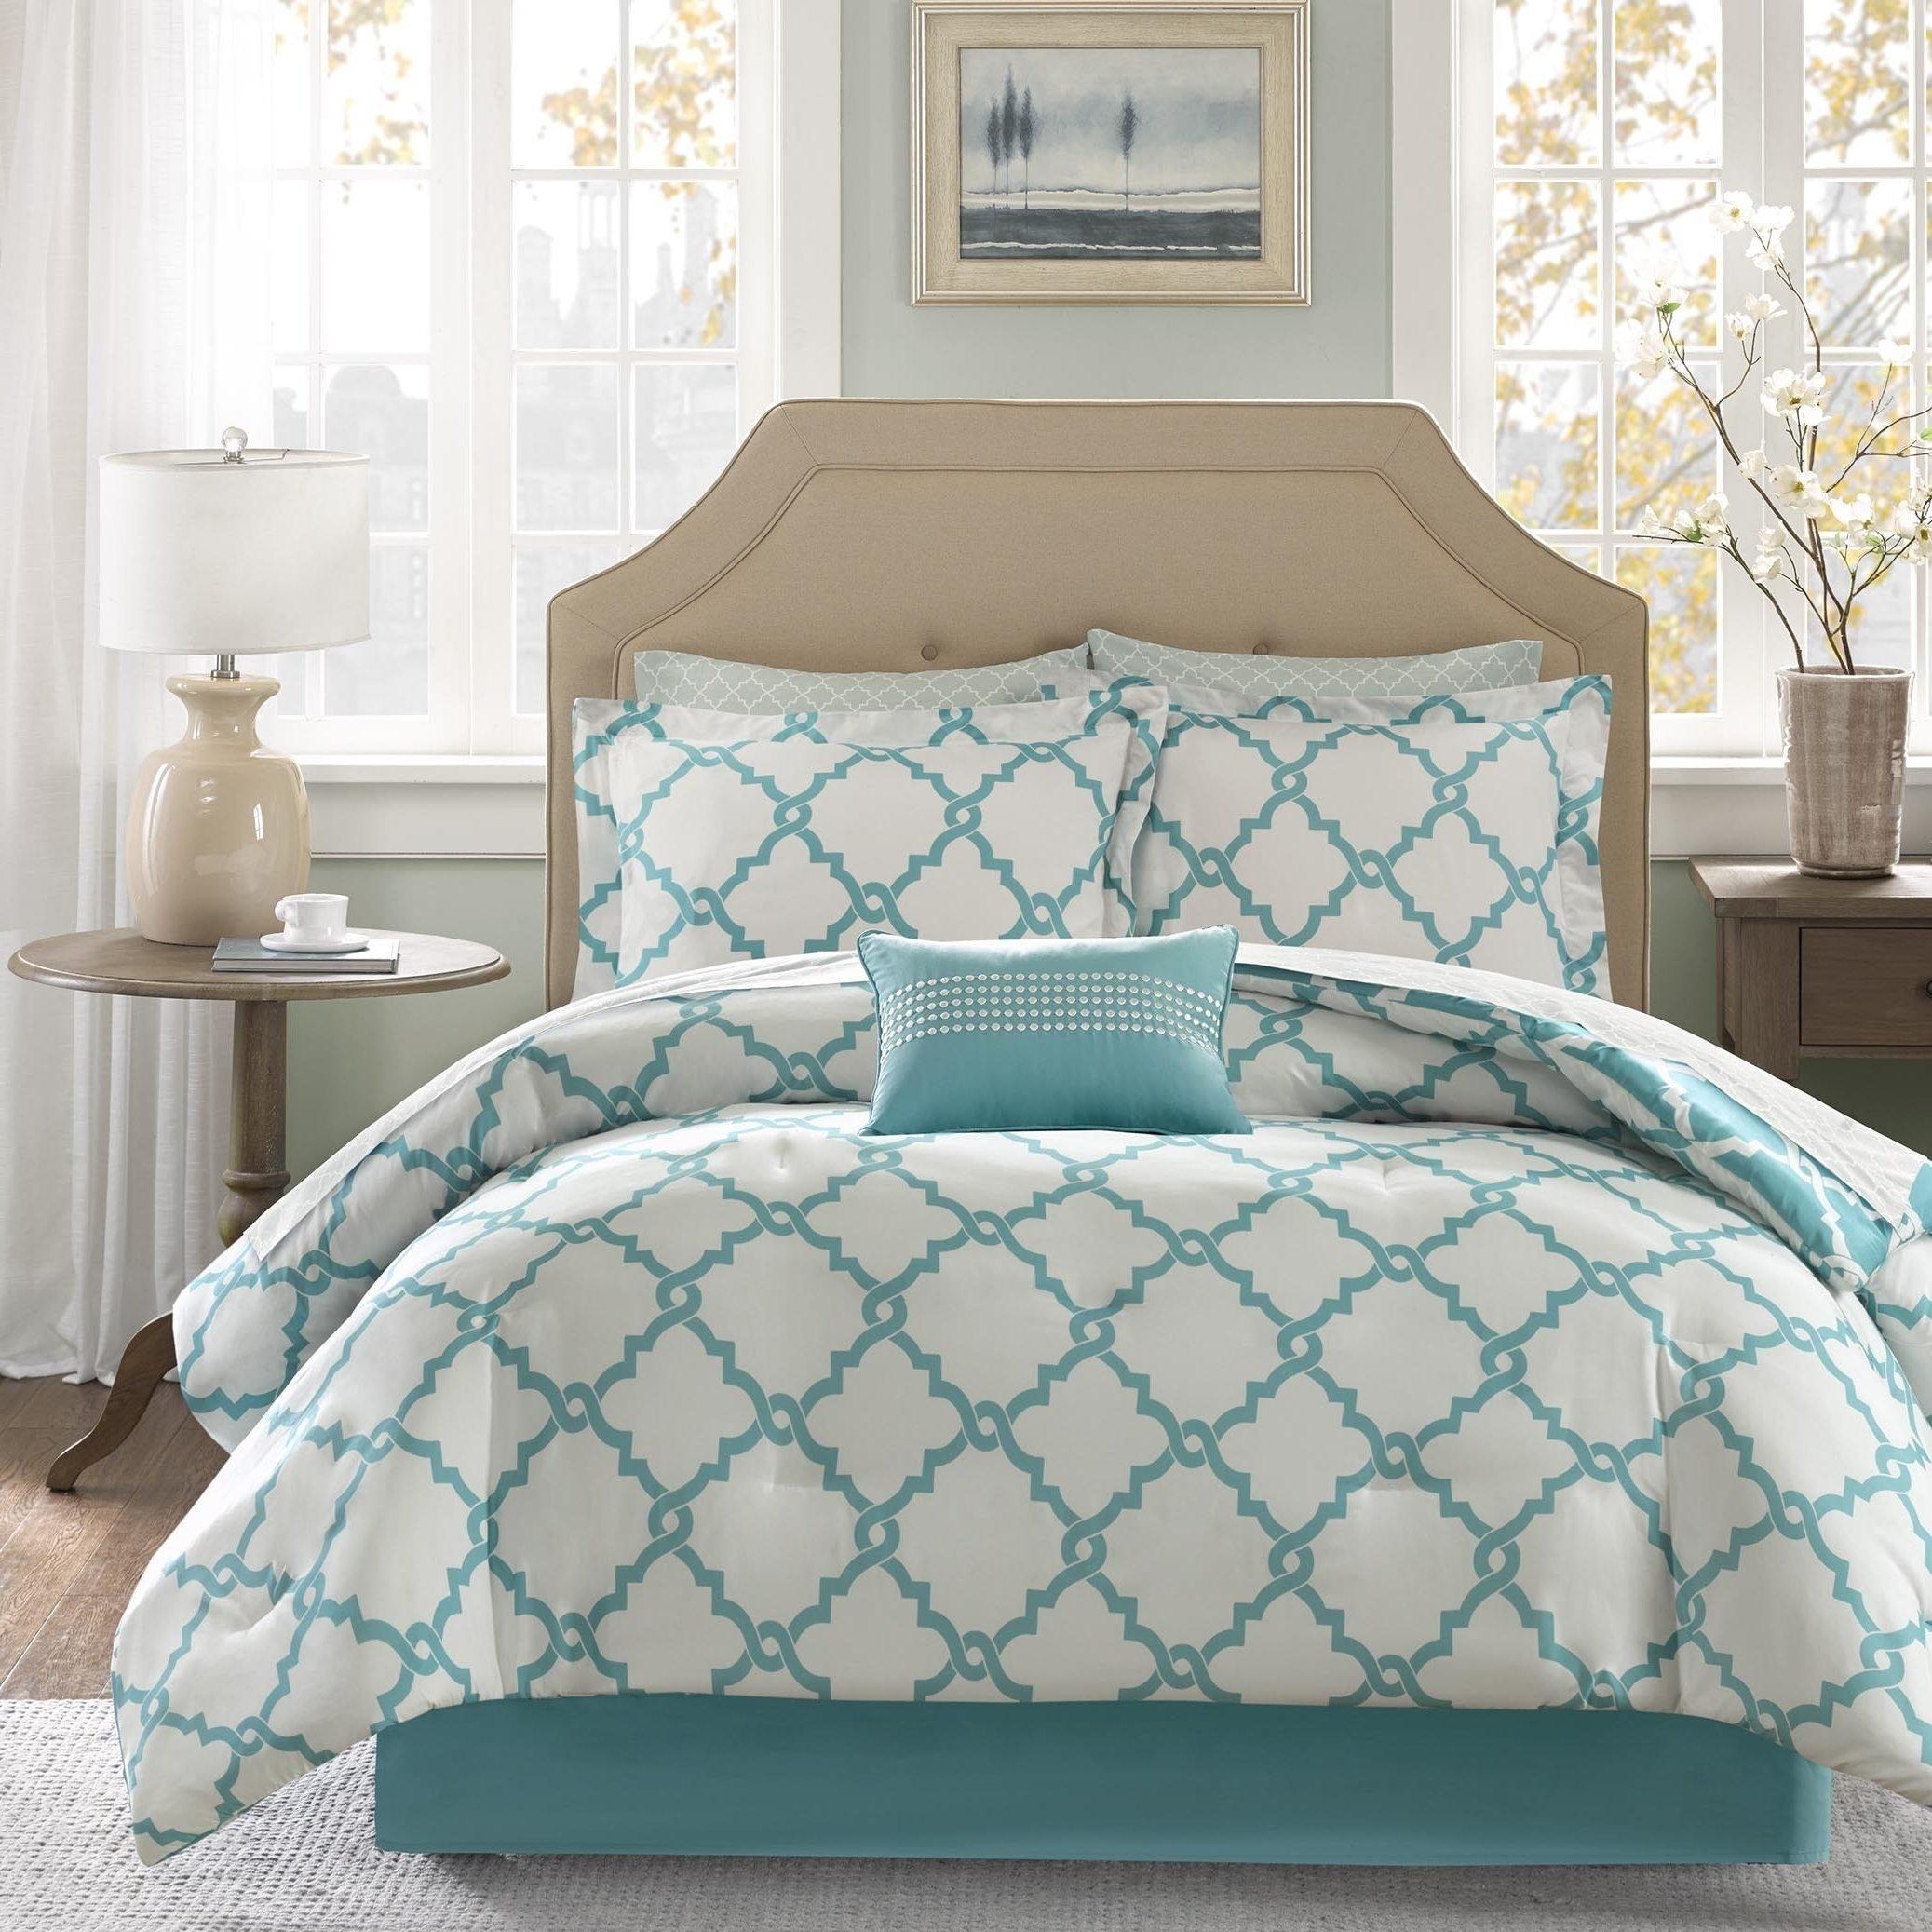 9 Piece Girls Aqua Blue Color Moroccan Comforter Set Full With Sheets, Beautiful Quatrefoil Fretwork Lattice Geometric Pattern Bold Light Blue Base Chic, Reversible White Teen, Microfiber